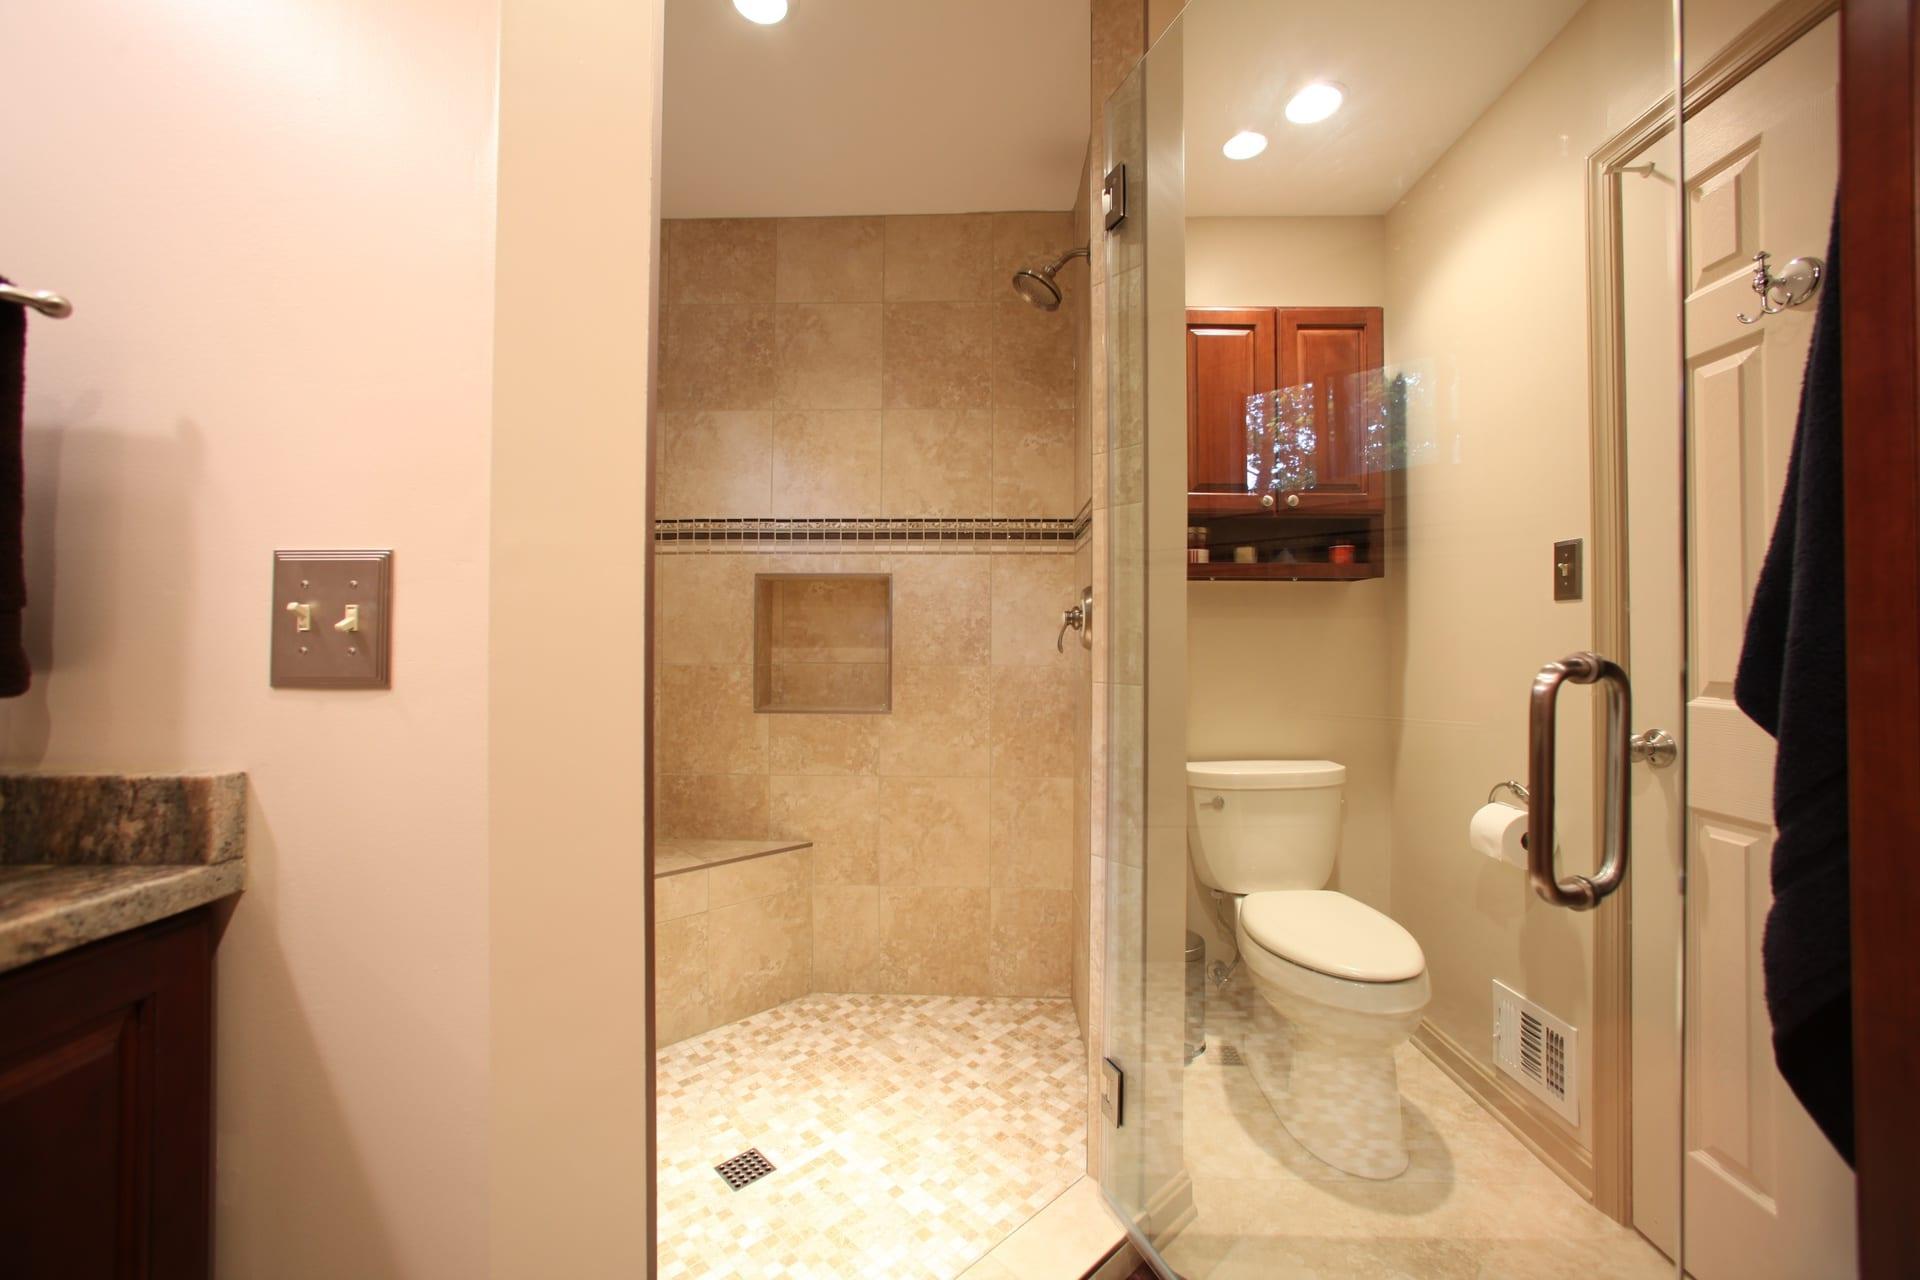 Bathroom Remodel - Hambleton Construction (3)